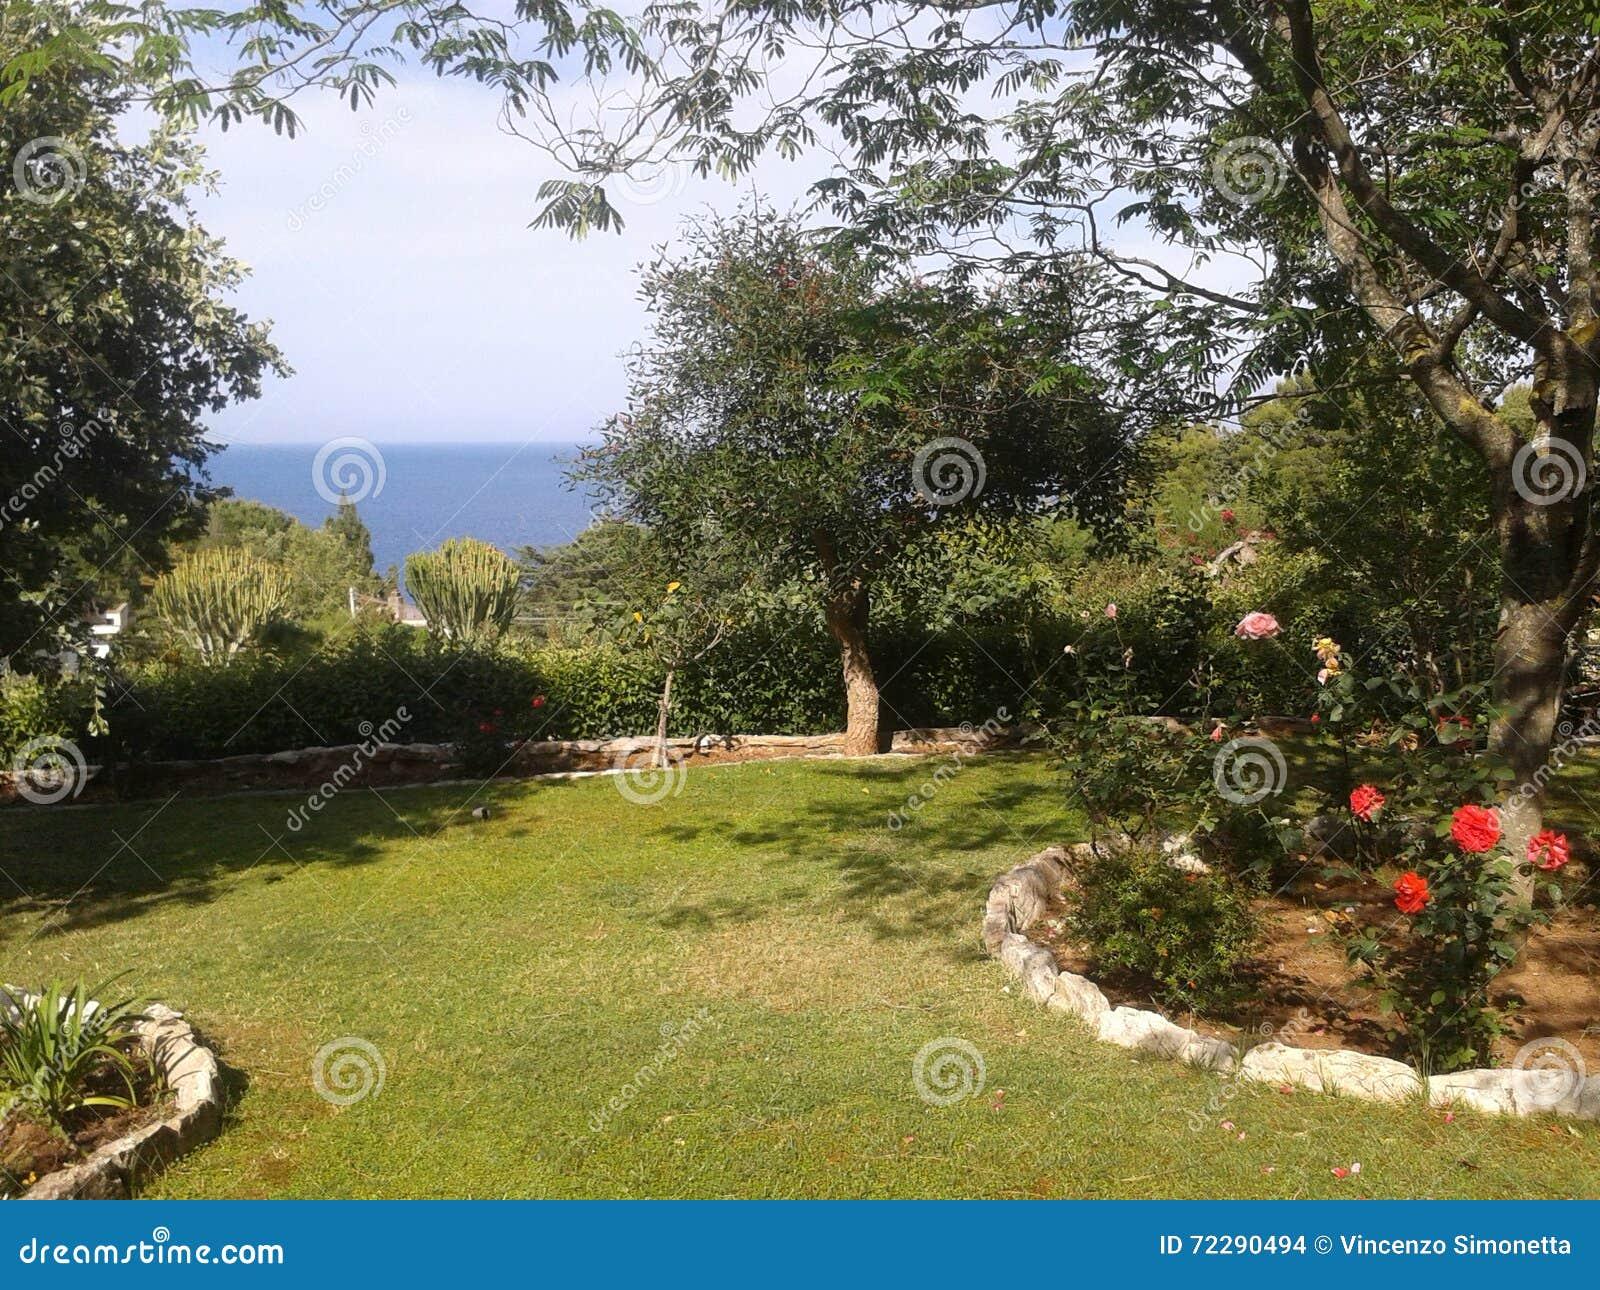 Download Сицилия стоковое фото. изображение насчитывающей сицилия - 72290494